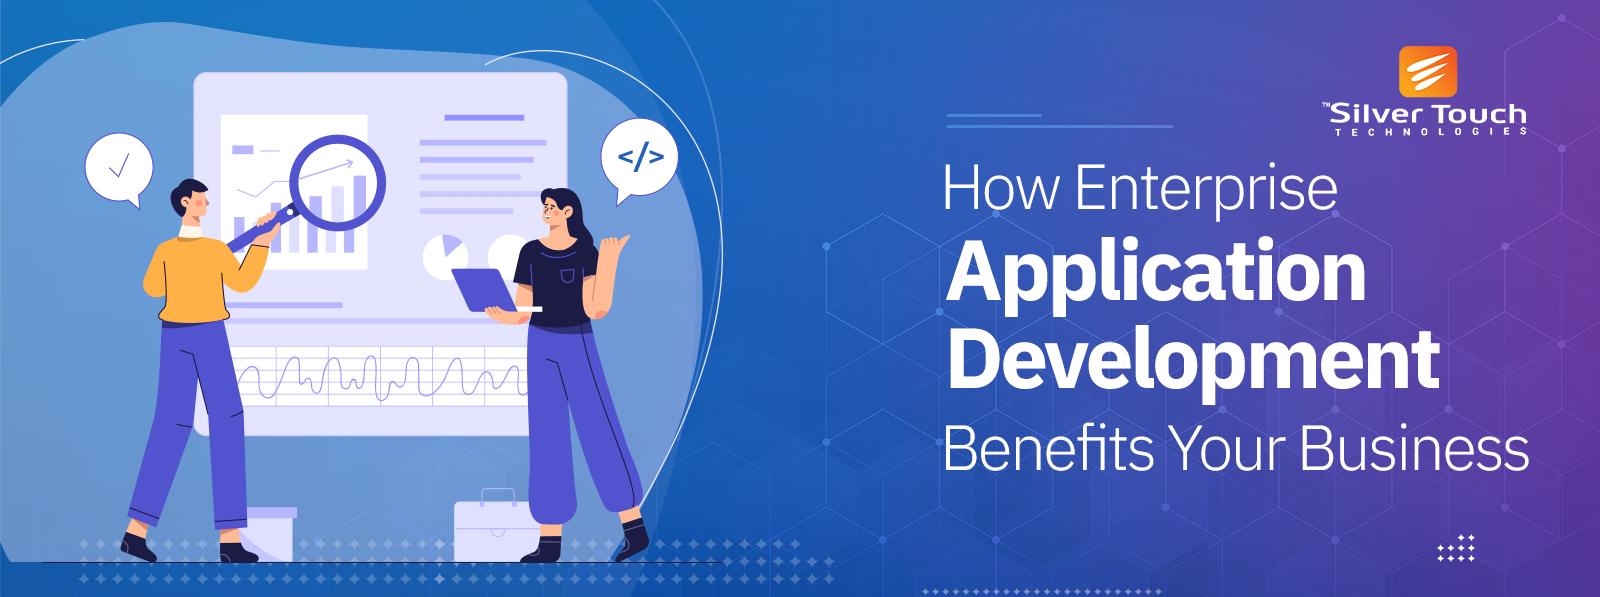 How Enterprise Application Development Benefits Your Business